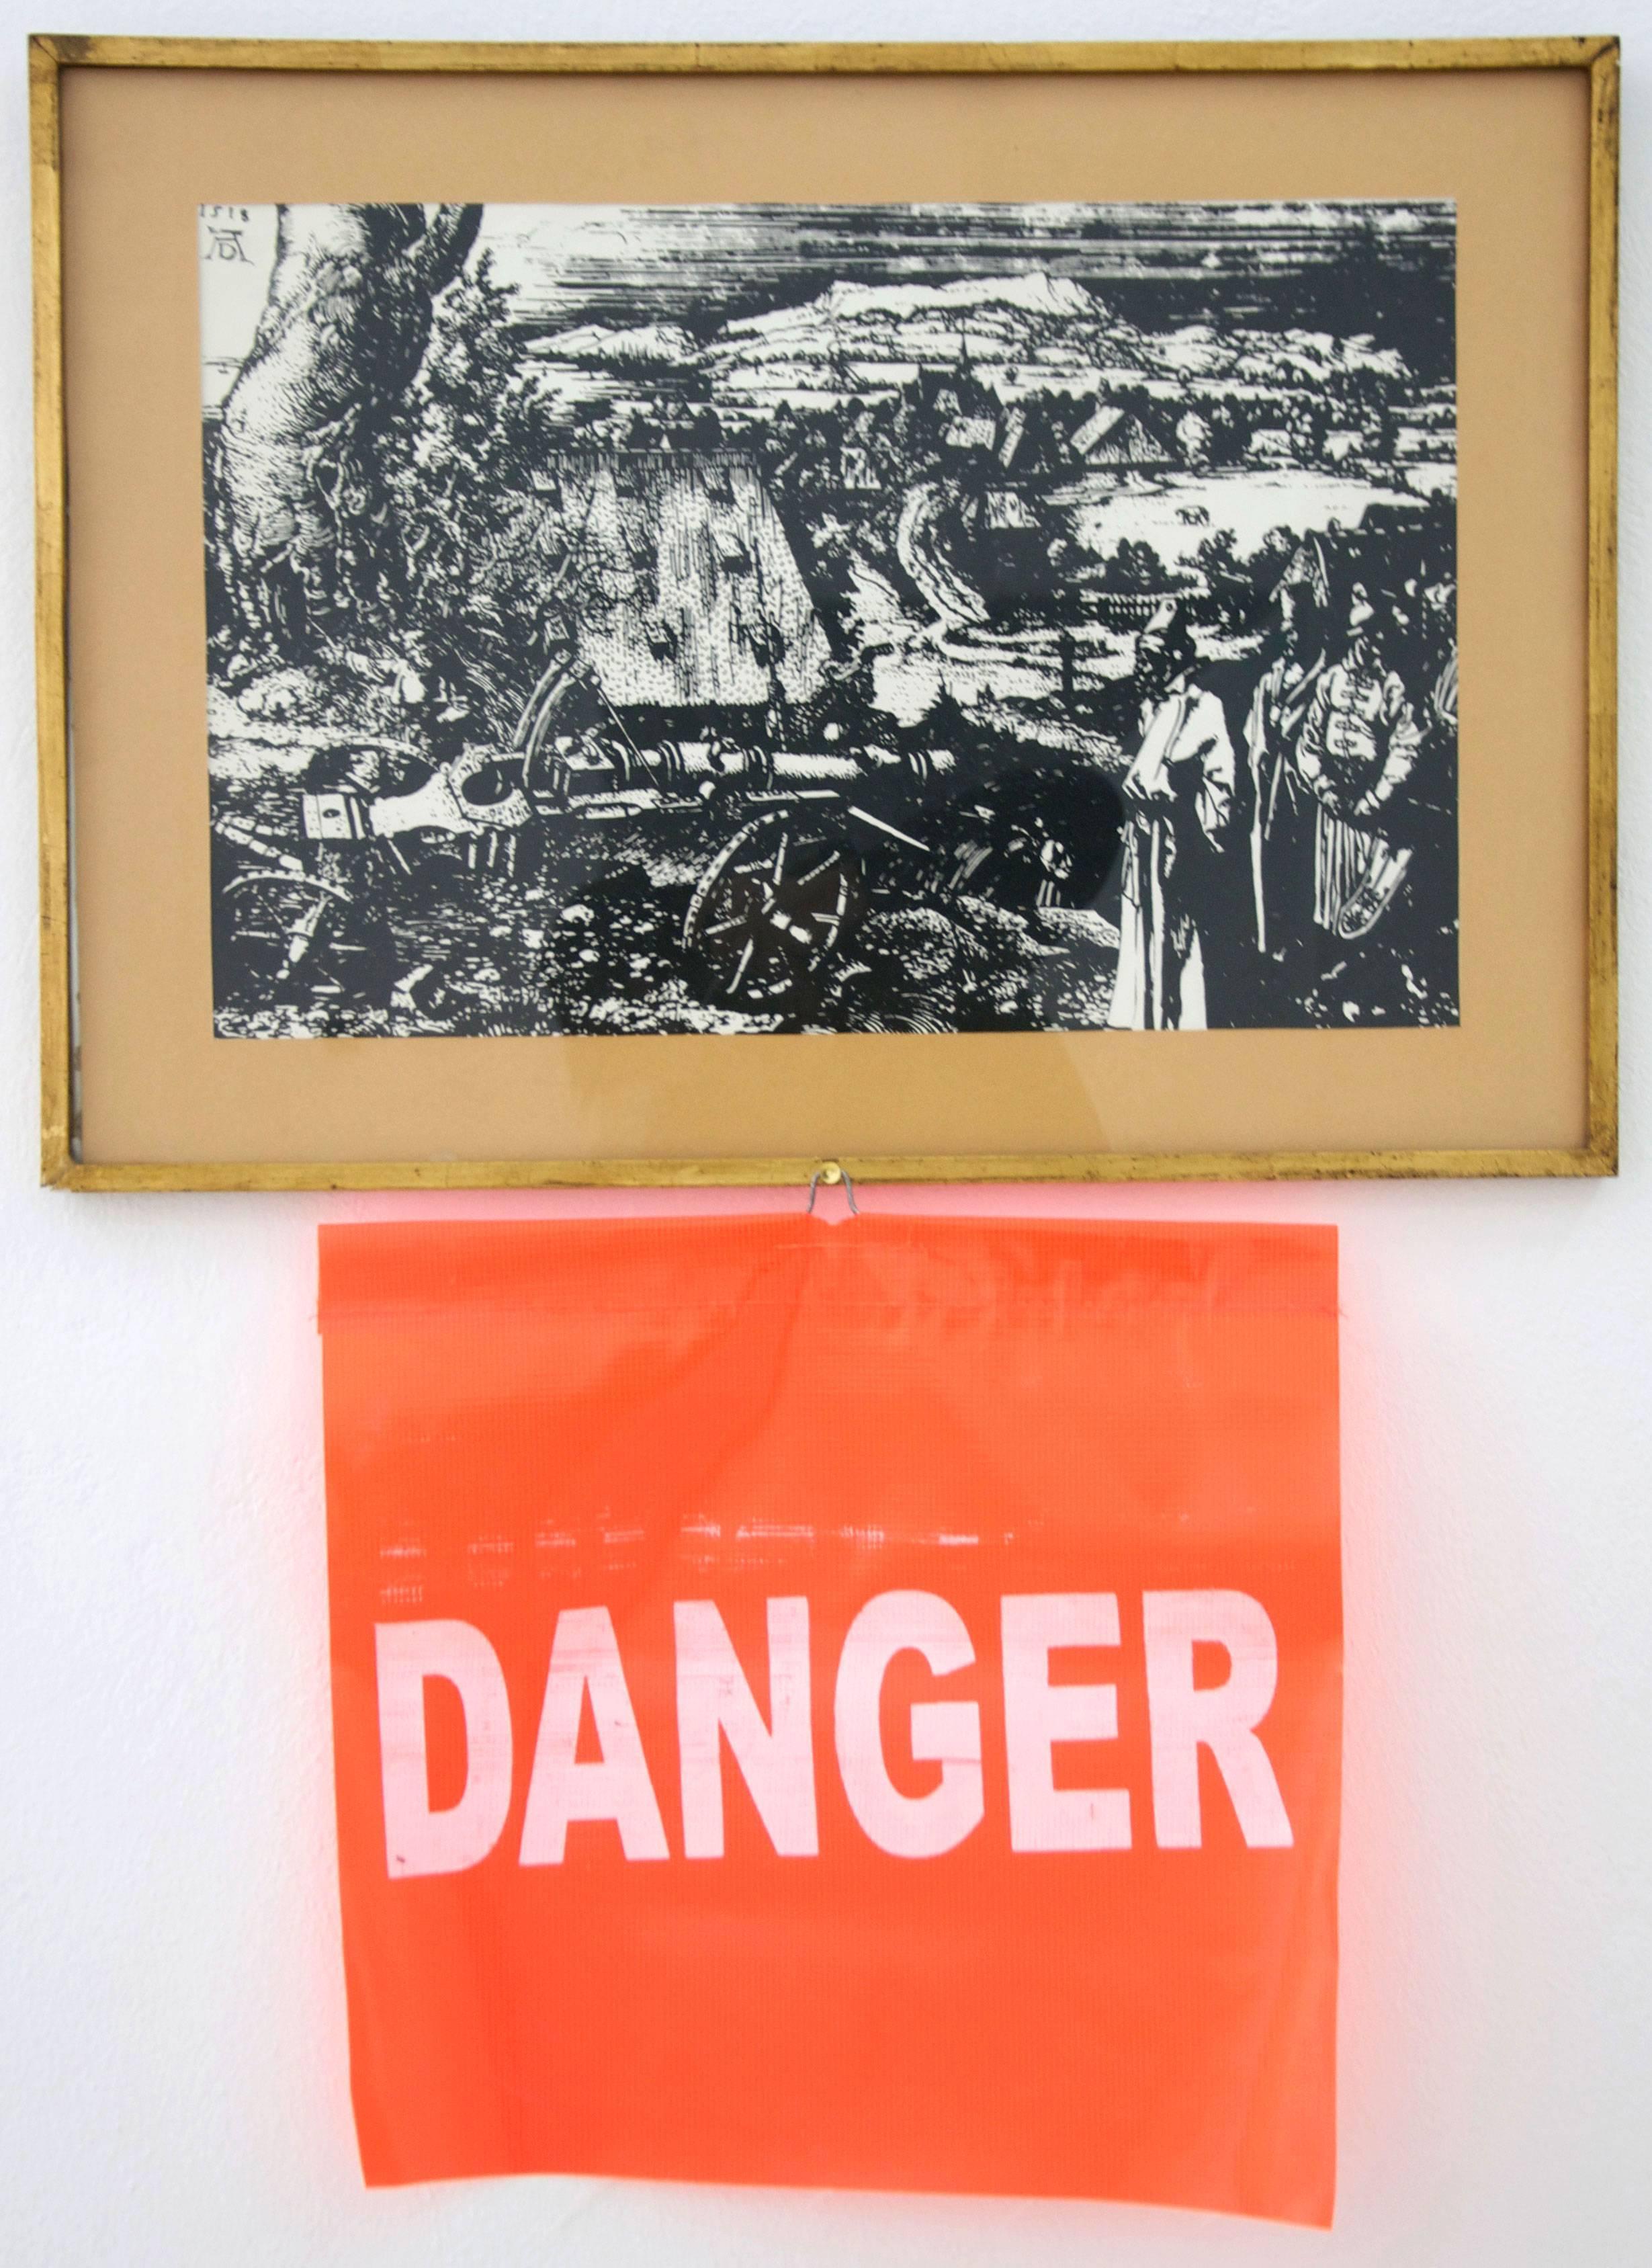 Danger with Albrecht Durer's, Landscape with Cannon